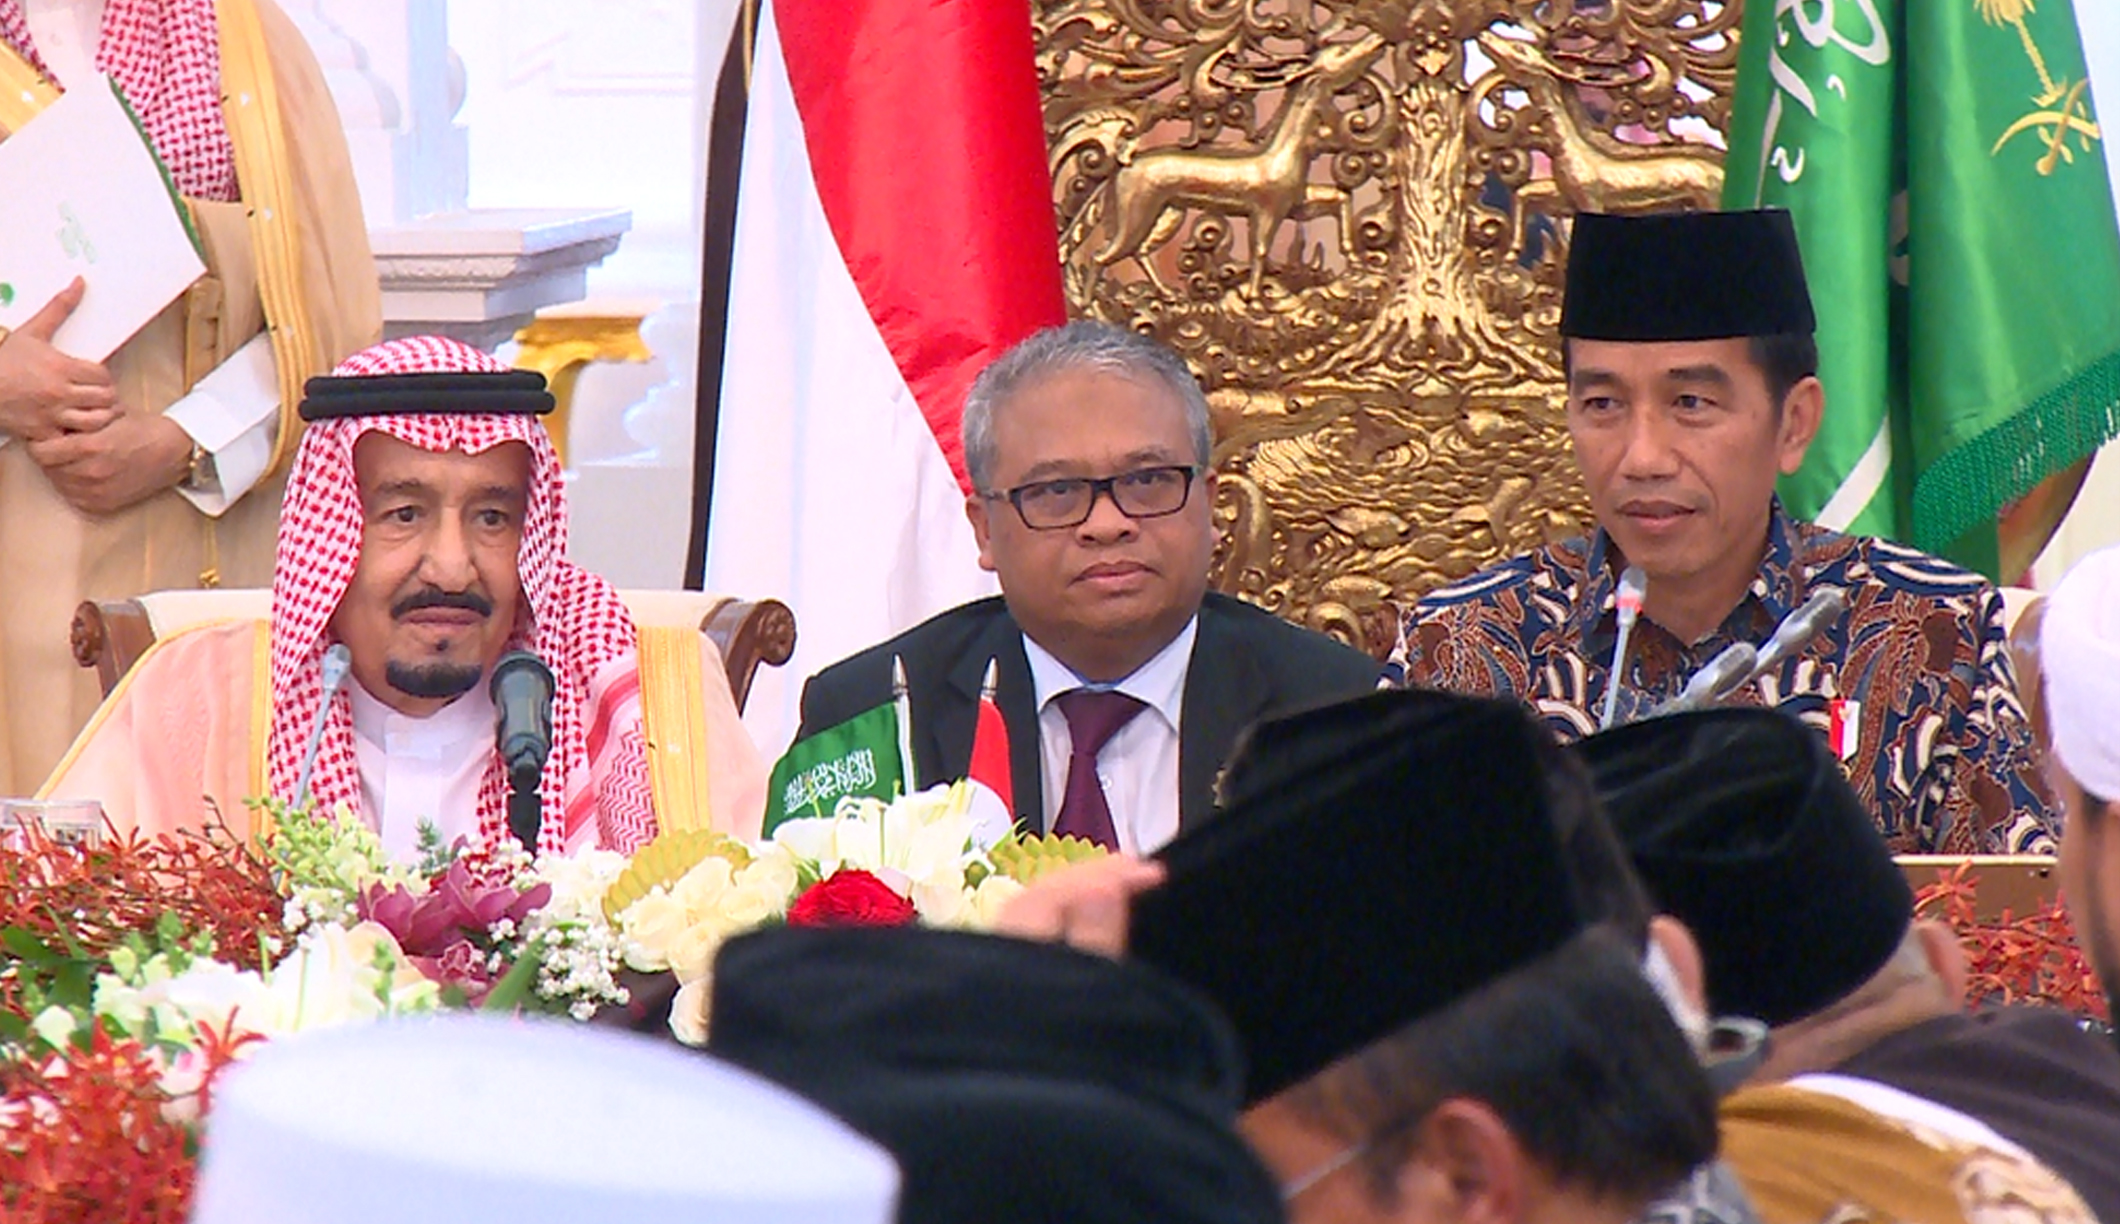 Raja Salman Diapresiasi Atas Penambahan Kuota Haji Indonesia